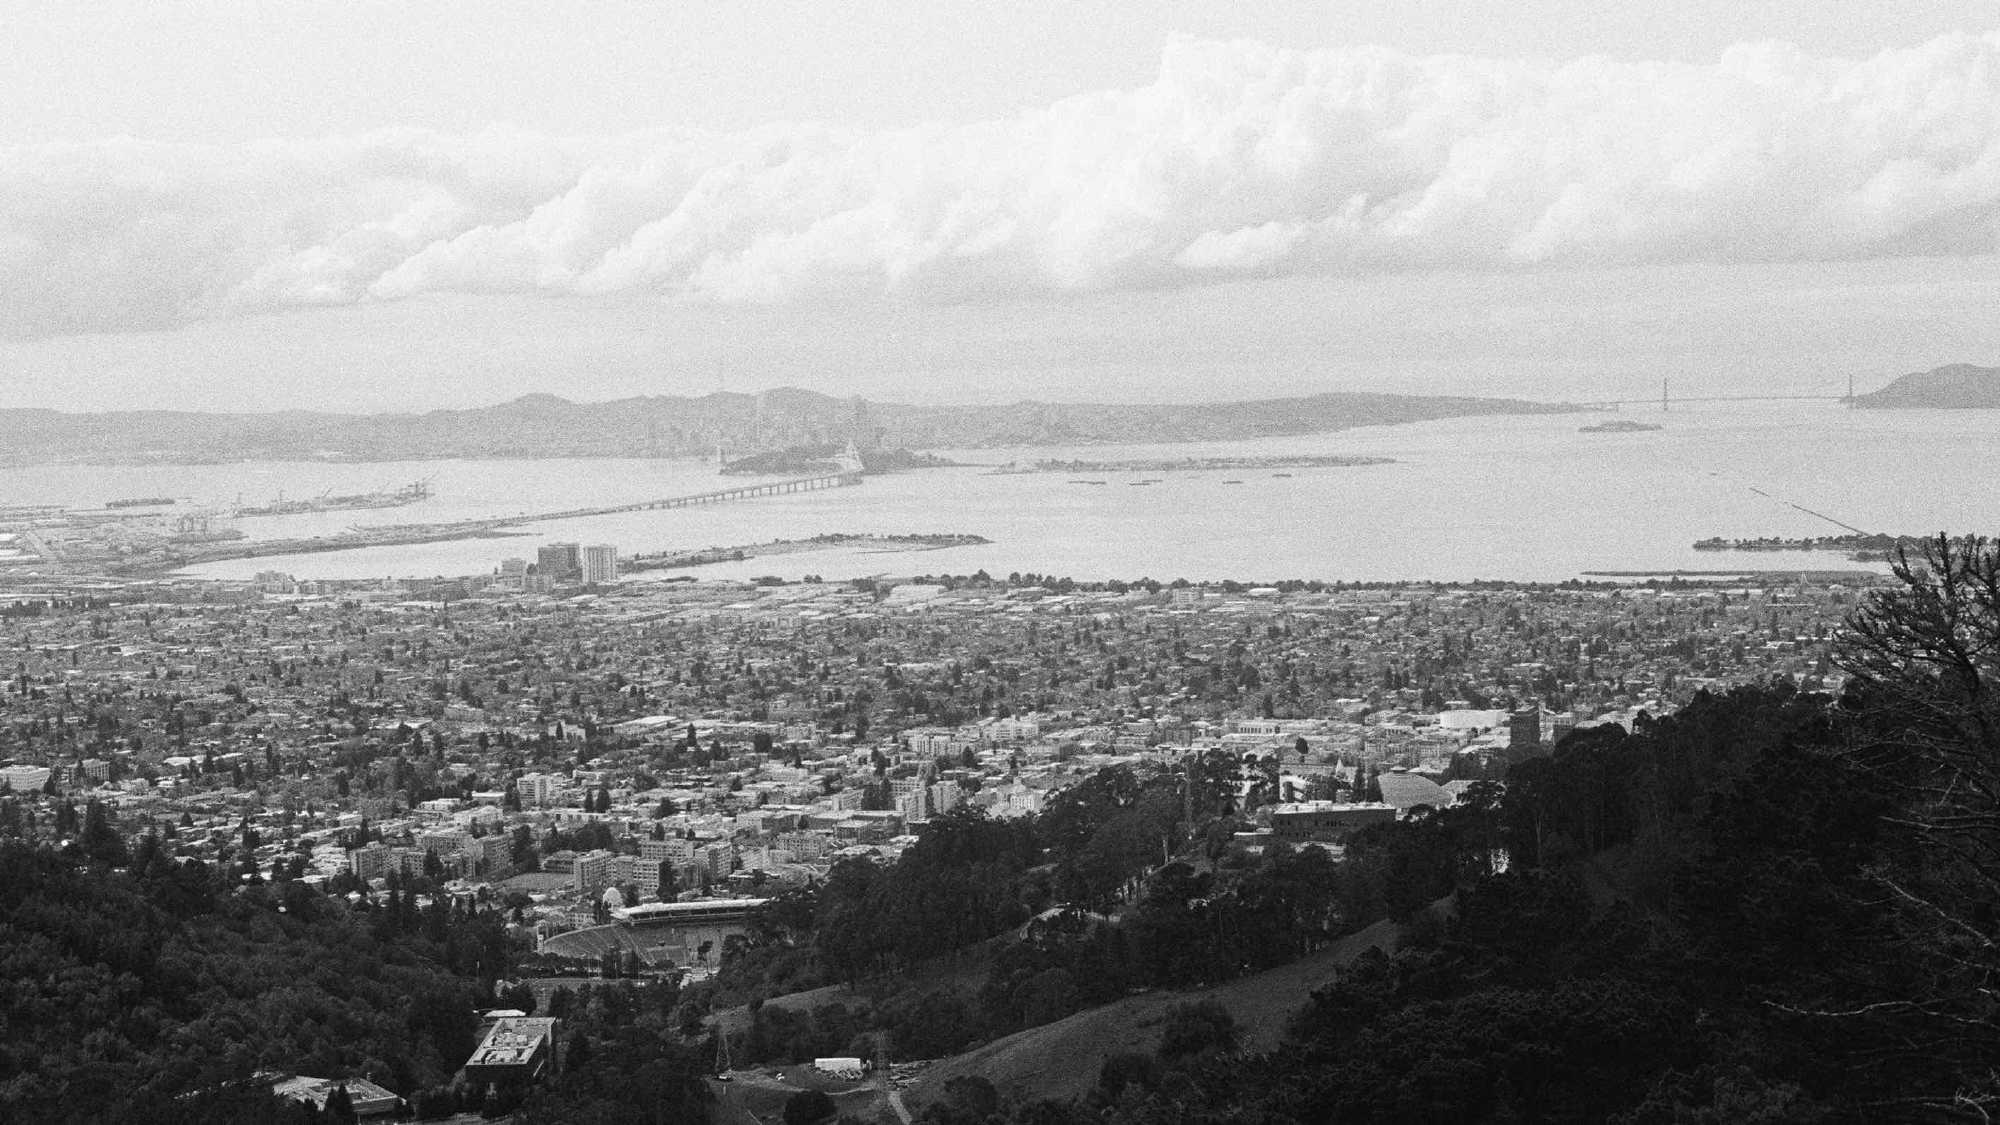 San Francisco Bay from the UC Berkeley Botanical Garden, March 2020